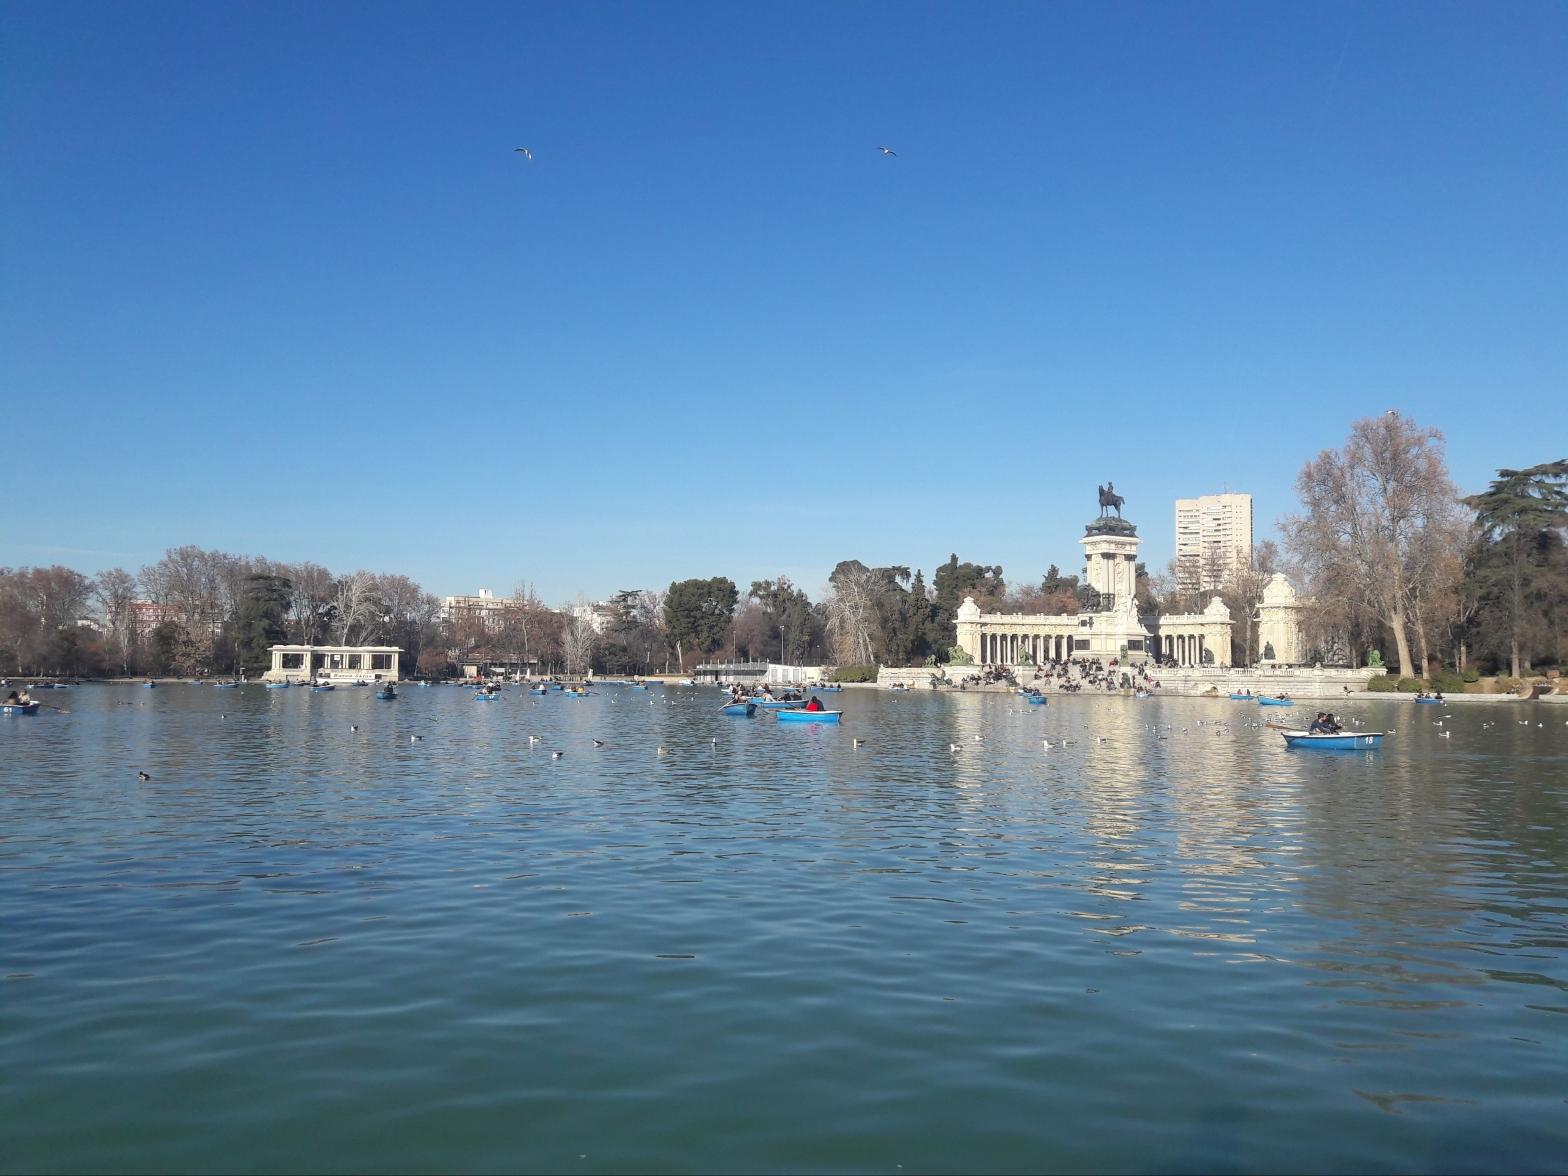 Boating Lake El Retiro